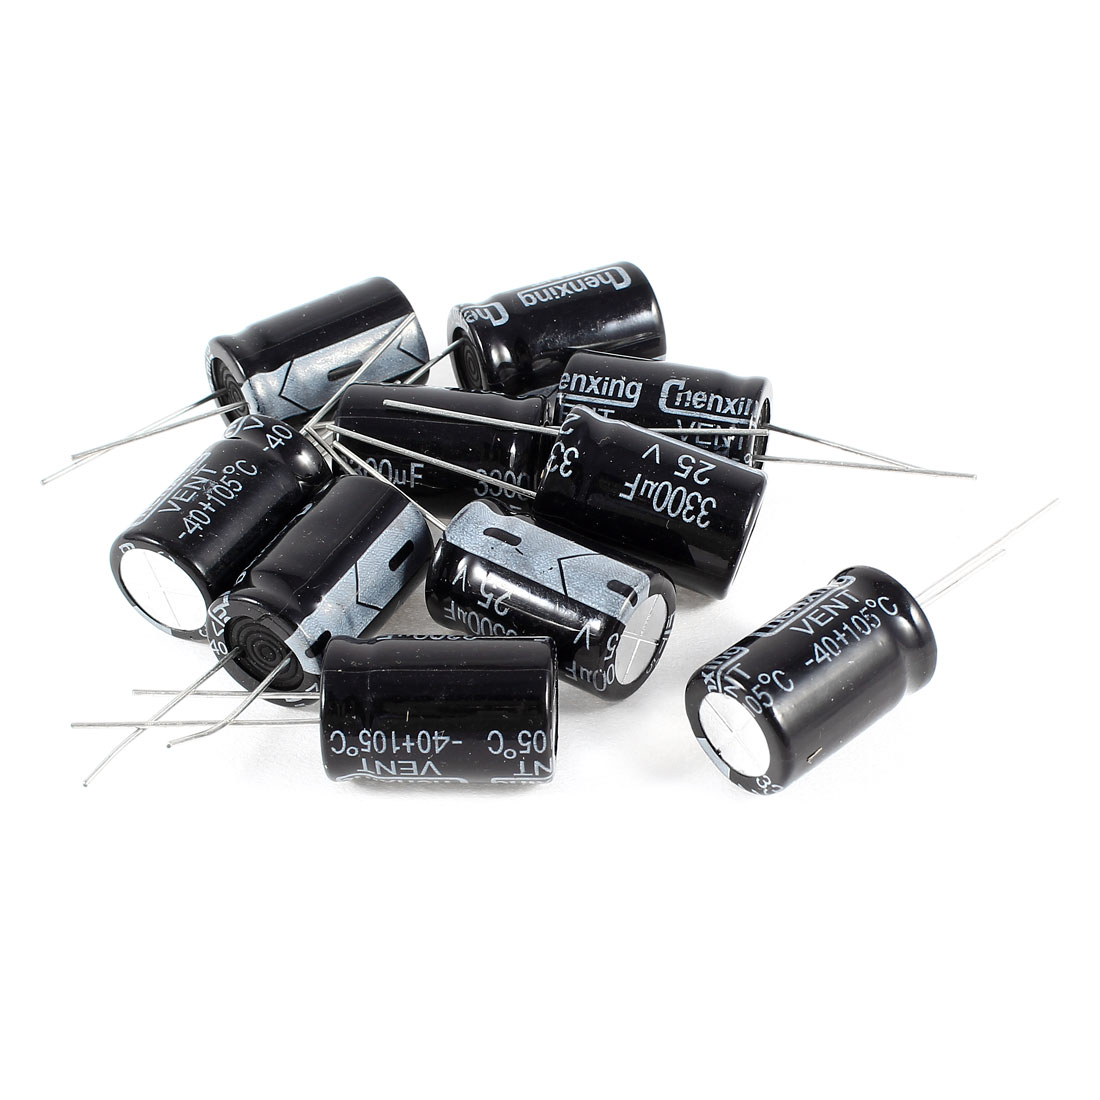 10 Pcs 3300uF 25V Radial Leads Aluminum Electrolytic Capacitors 16x25mm